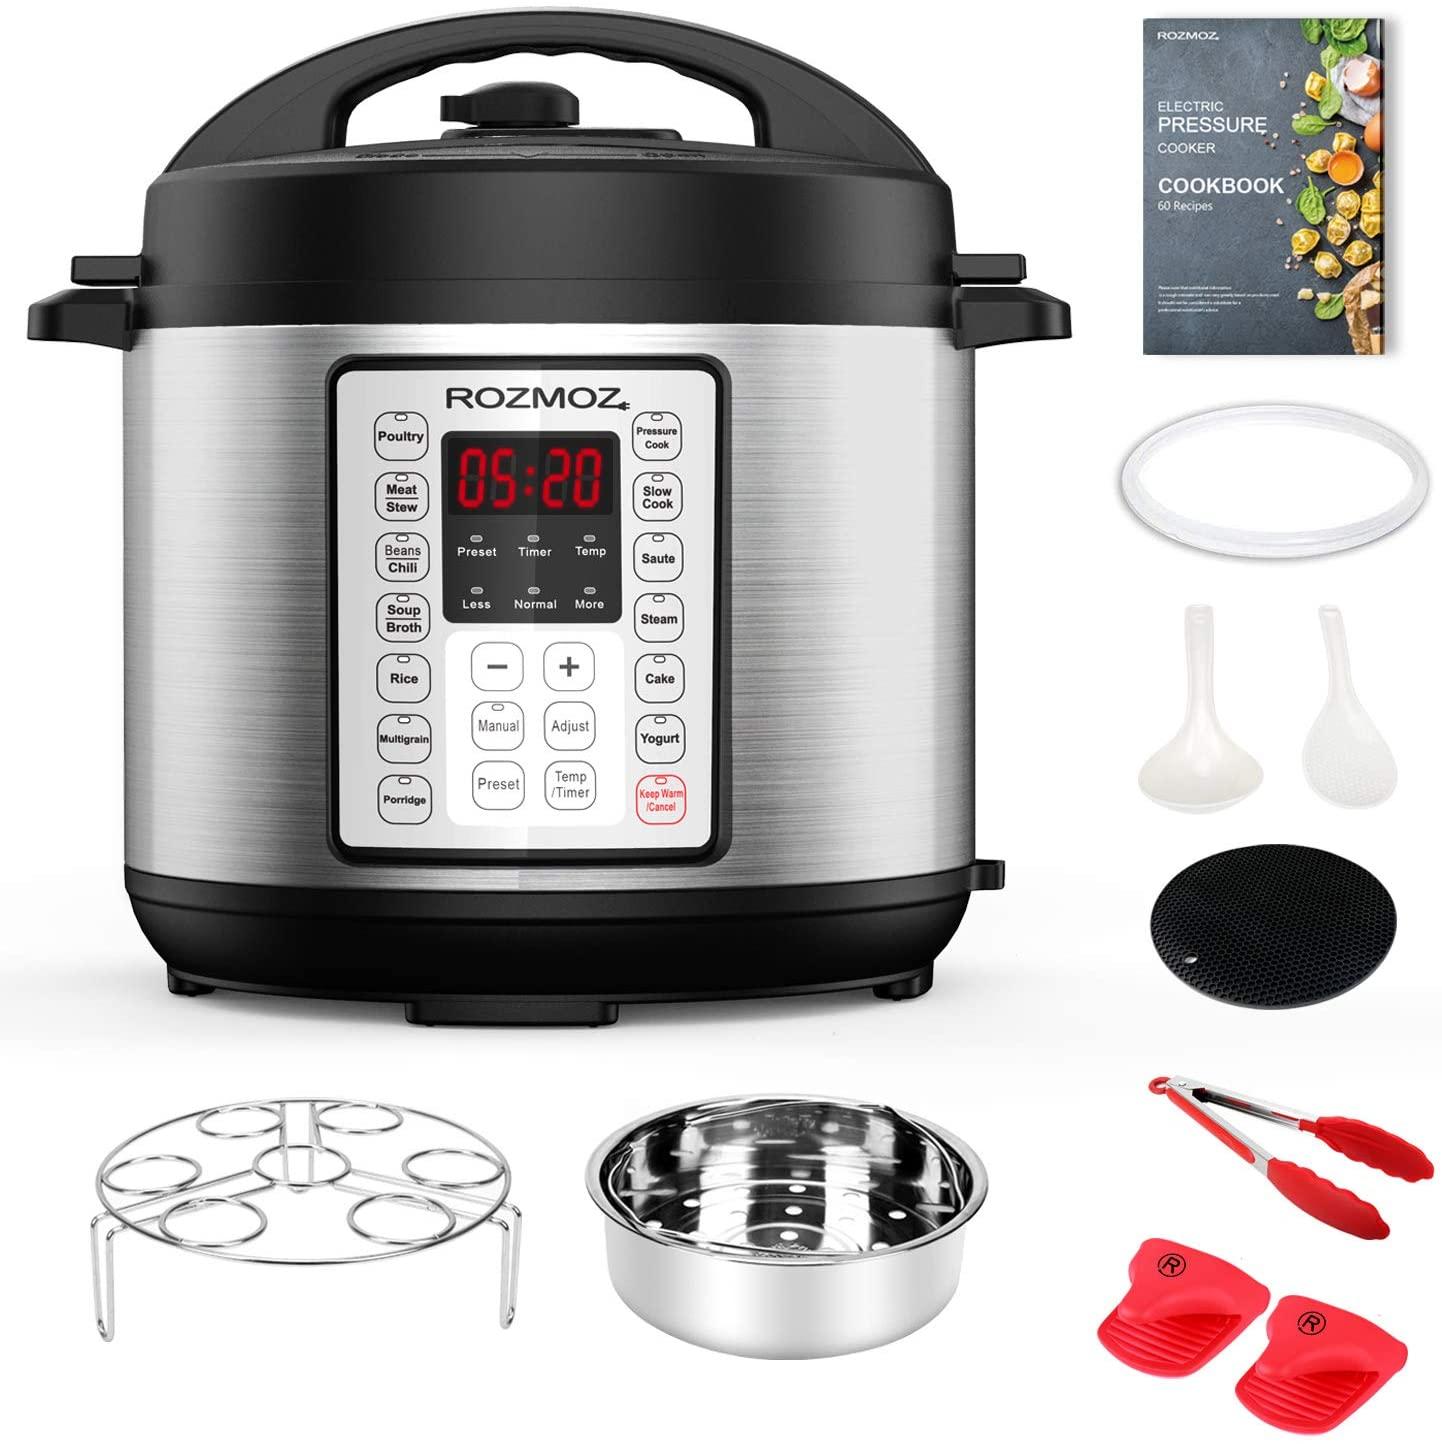 Rozmoz electric pressure cooker